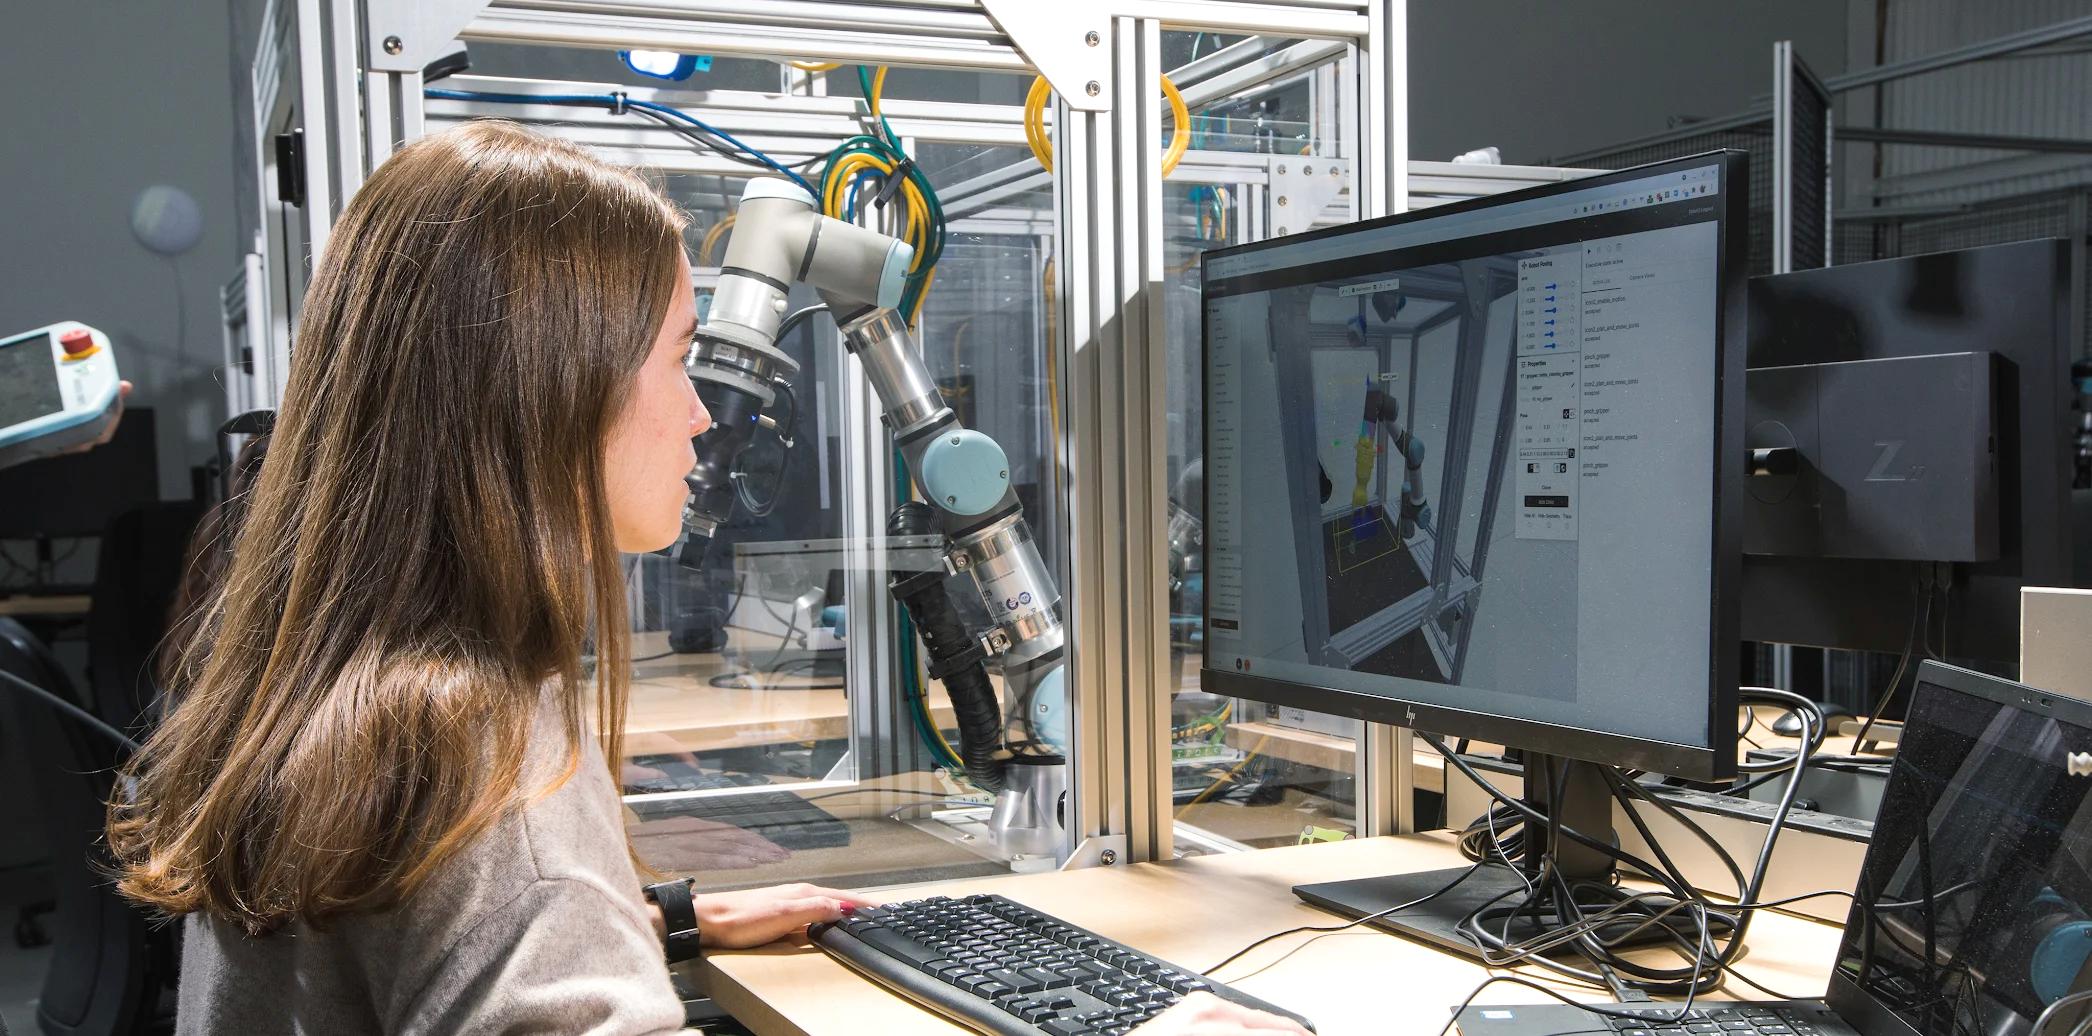 venturebeat.com - Paul Sawers - Alphabet's Intrinsic aims to unlock industrial robotics' economic potential